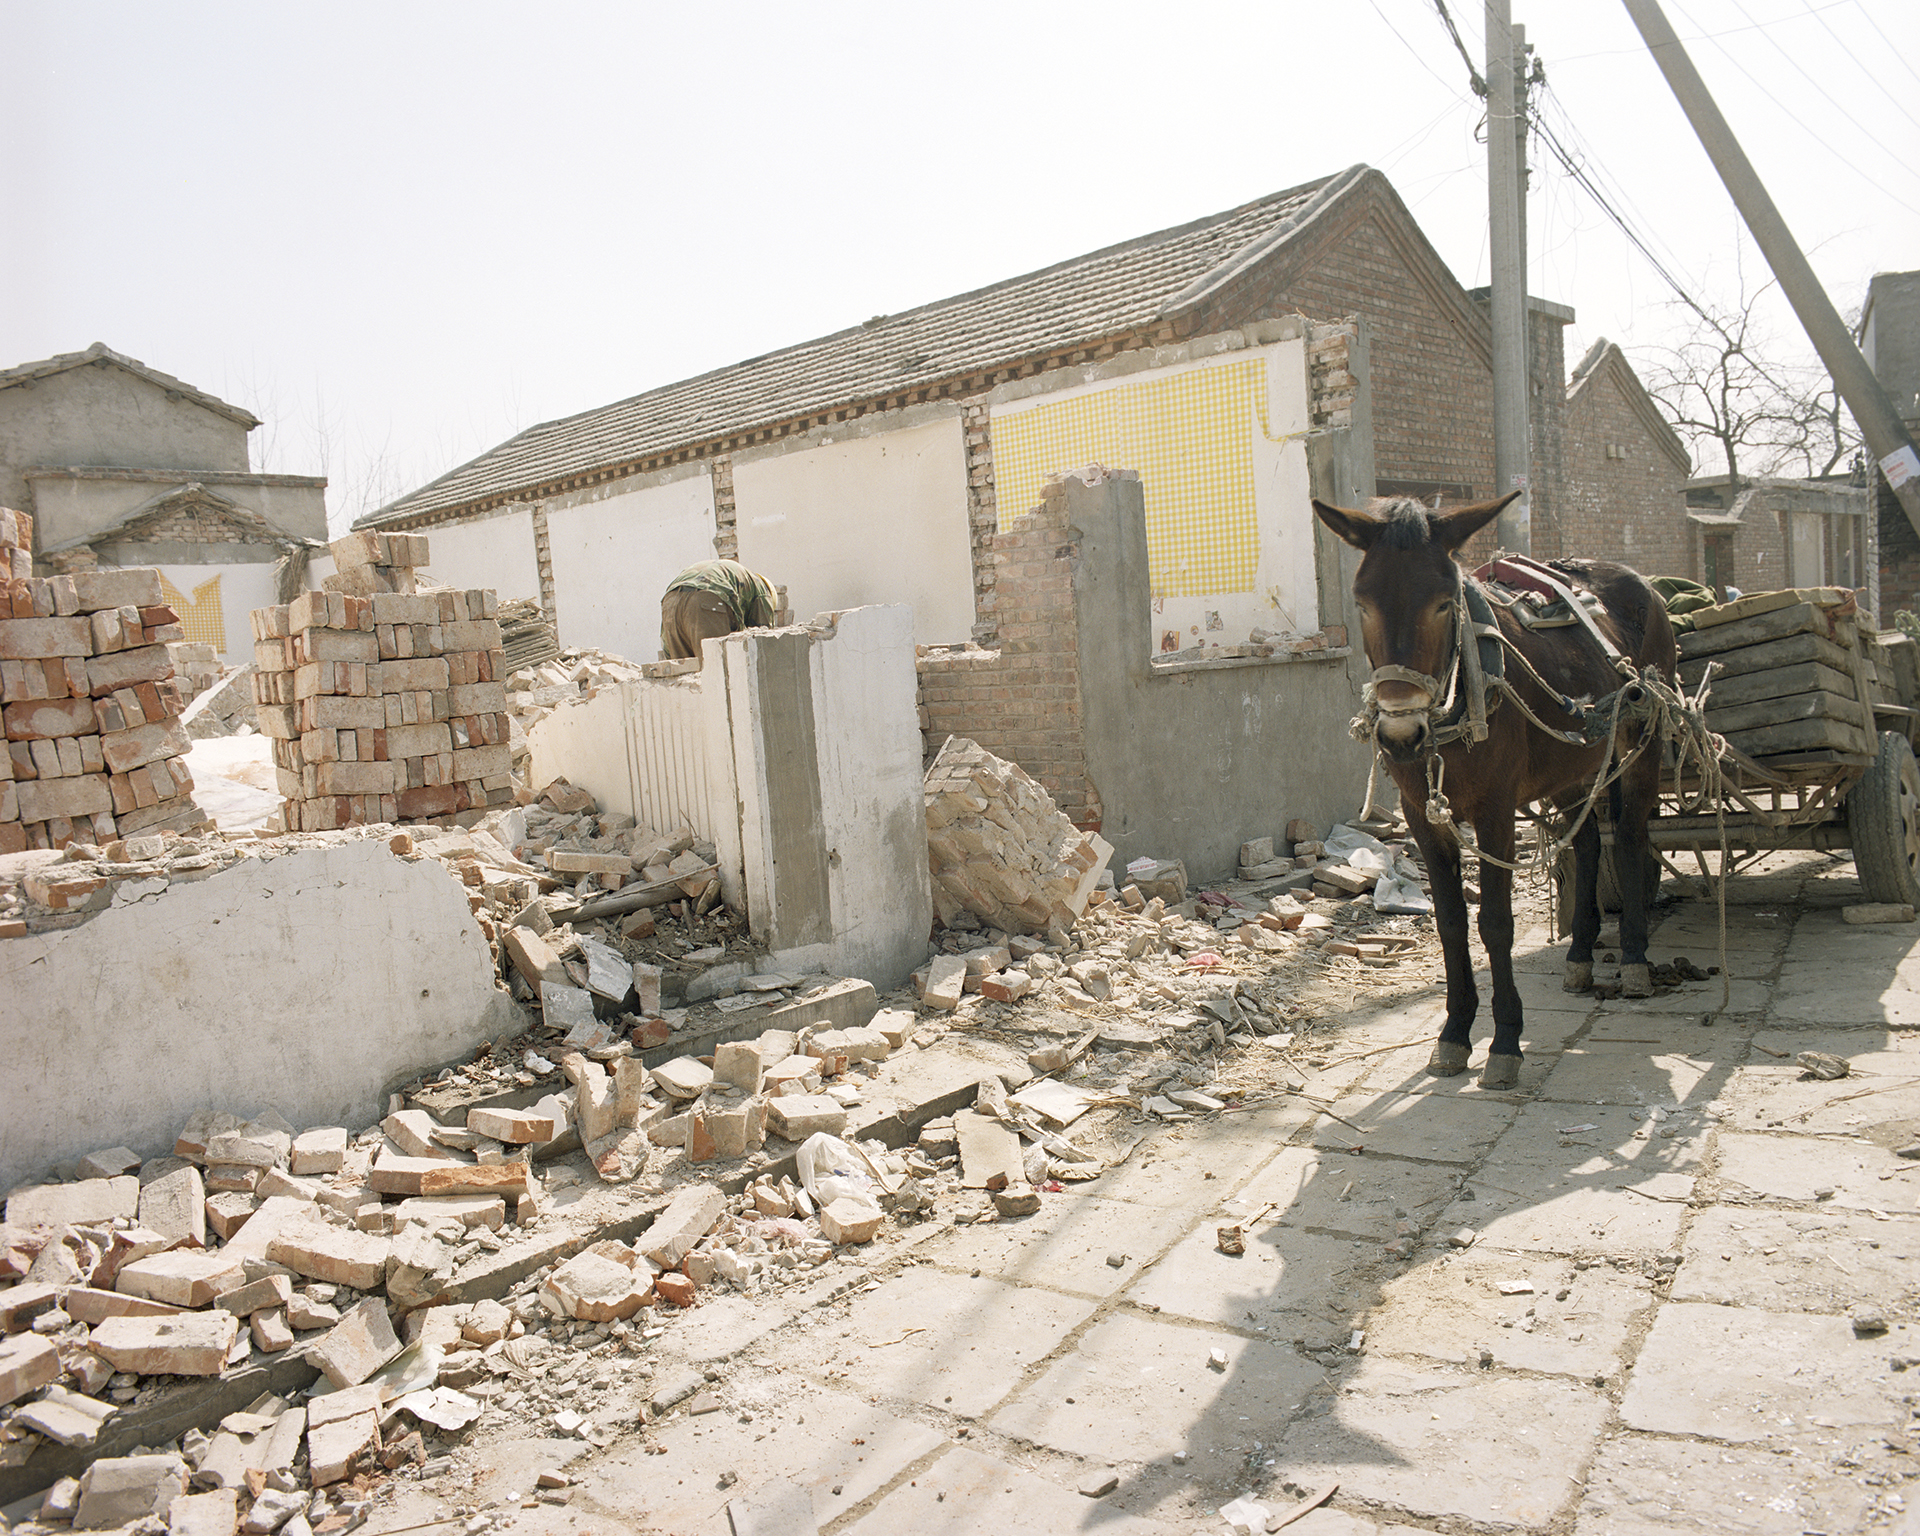 Saving building materials.